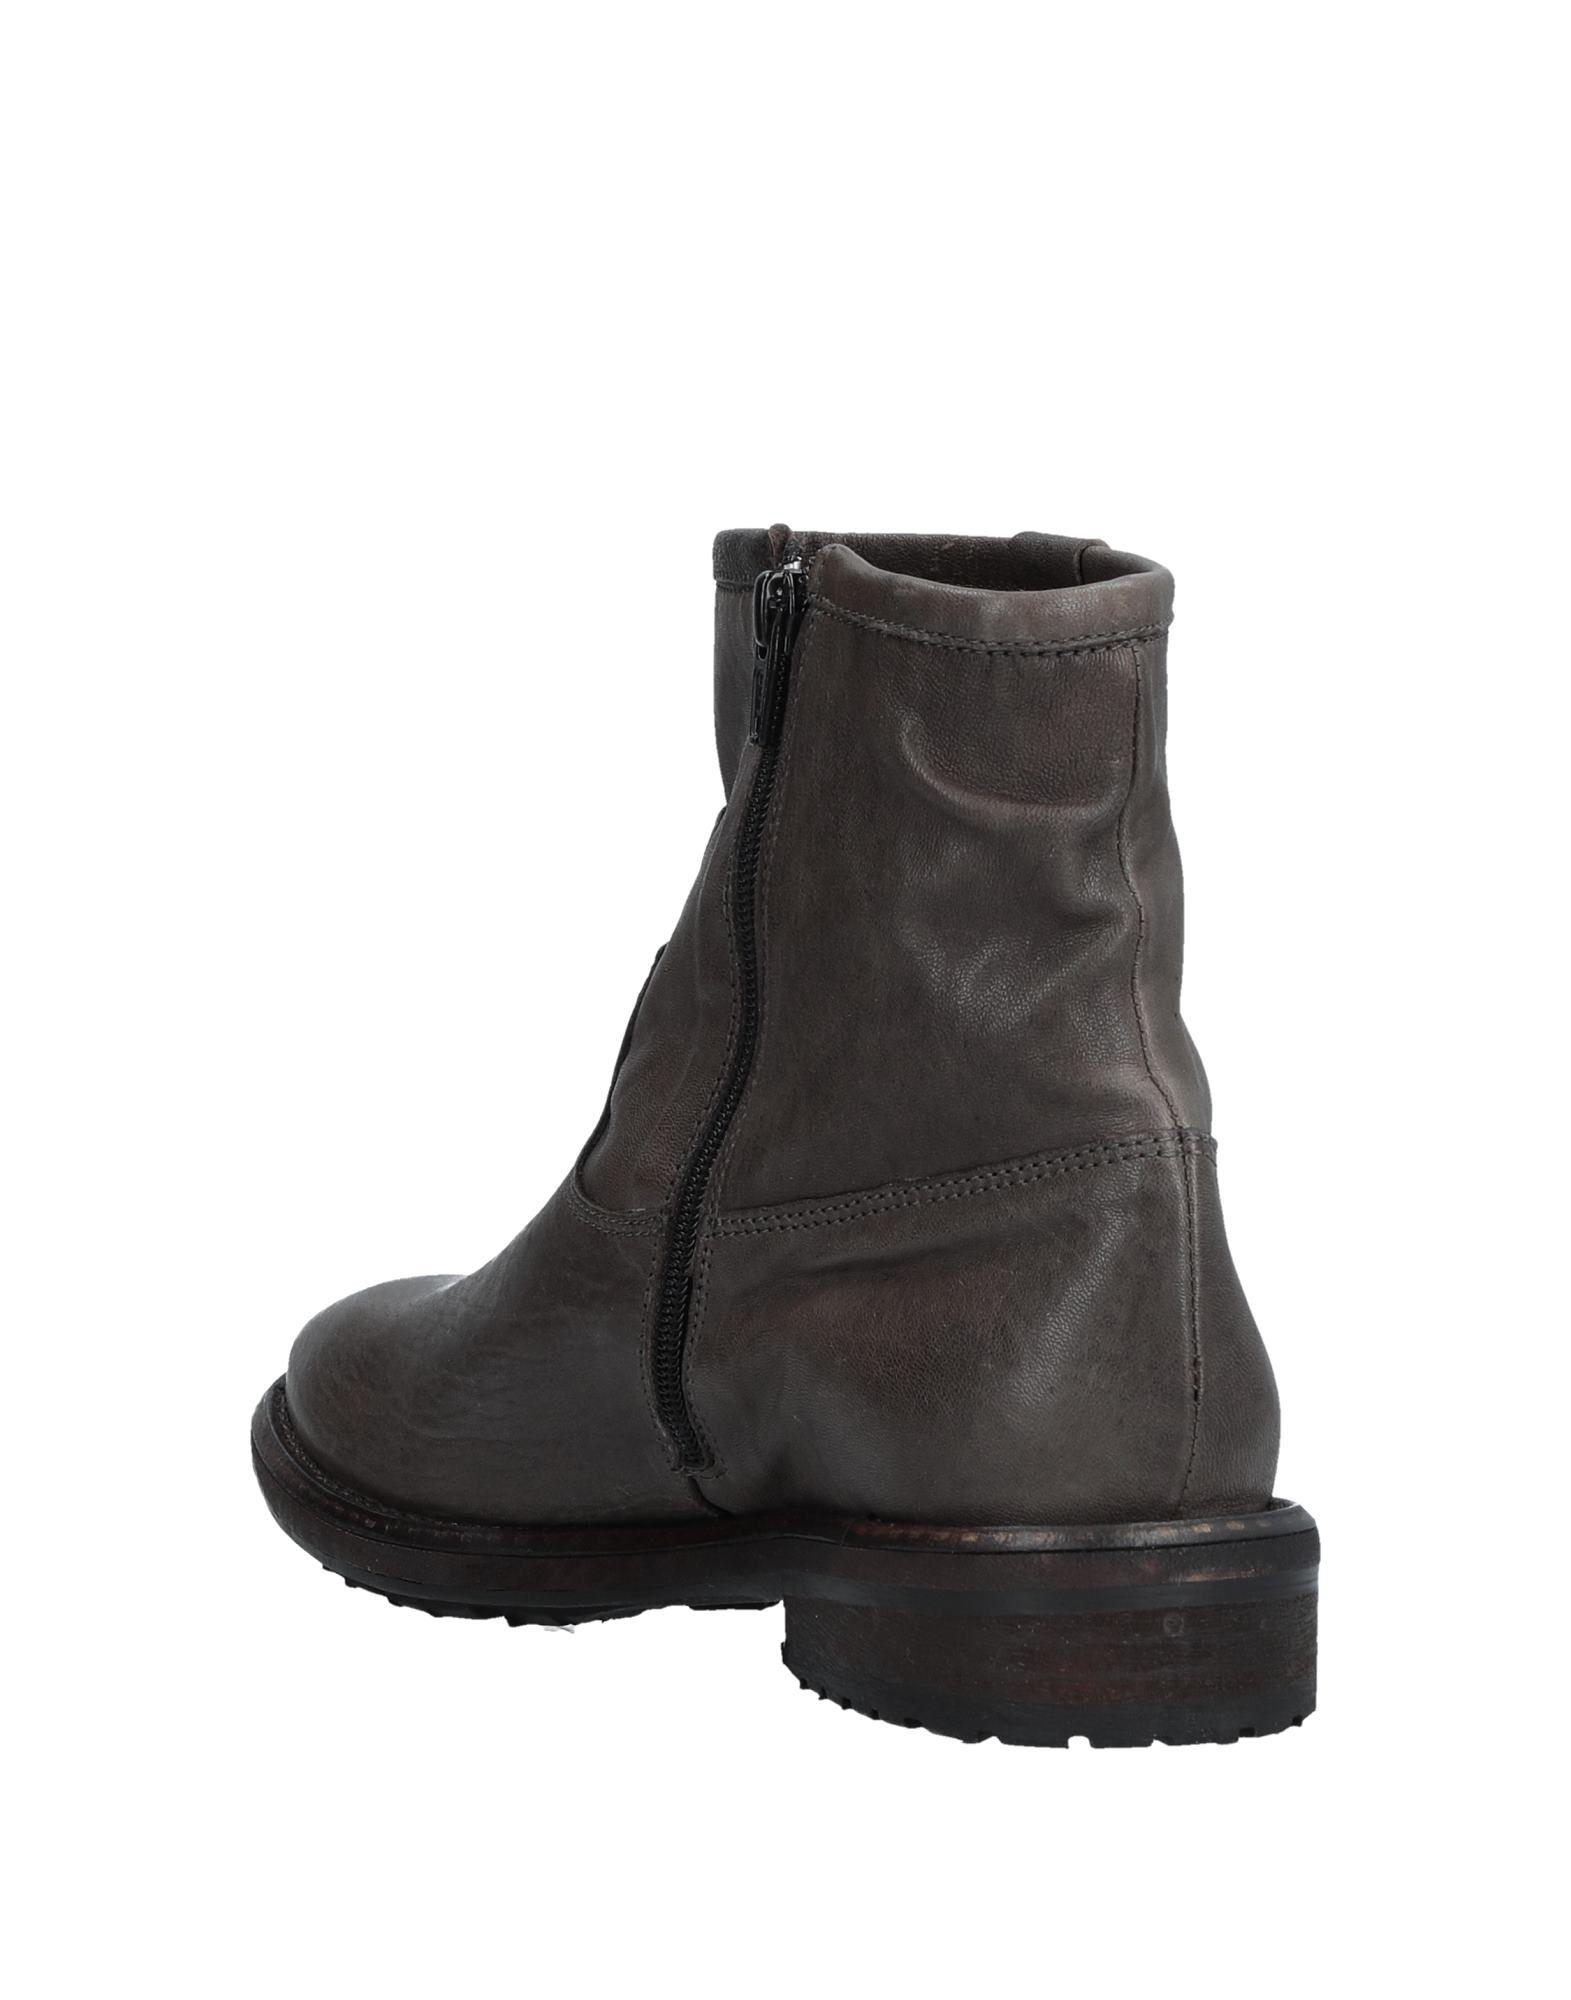 Weg 11526241PX Stiefelette Damen  11526241PX Weg Gute Qualität beliebte Schuhe 0bbffd